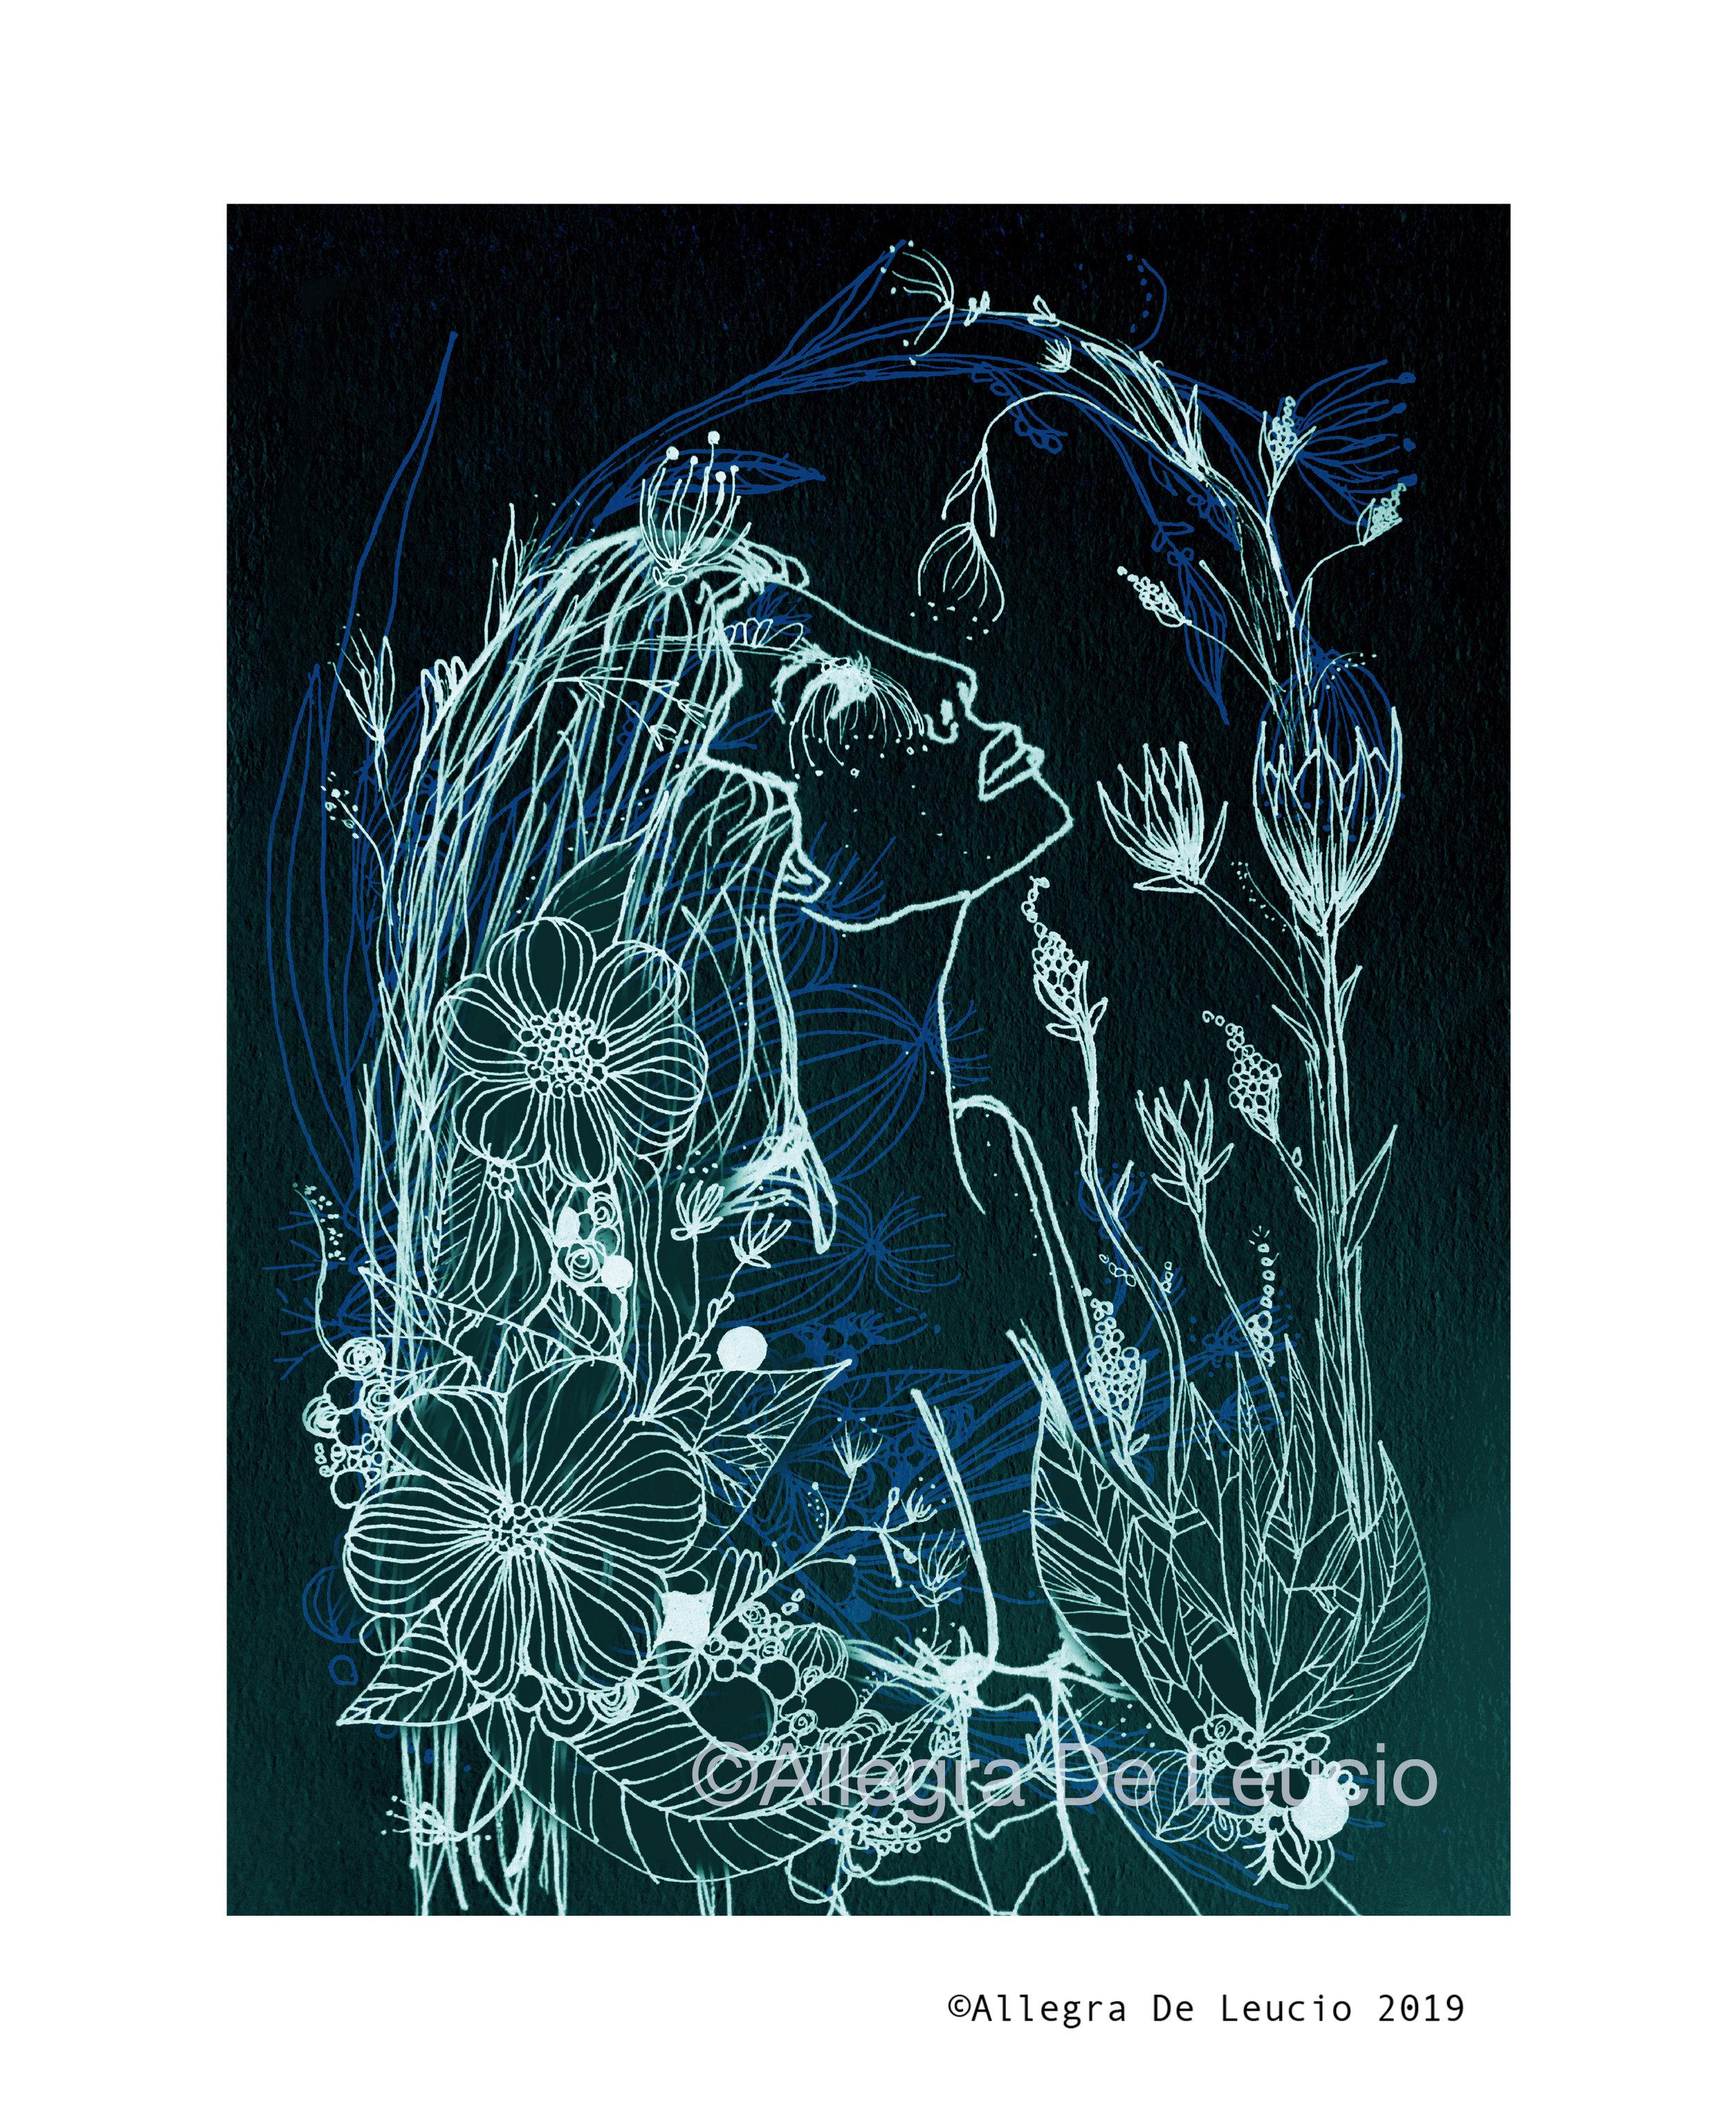 Botanical Tranquility - design #13